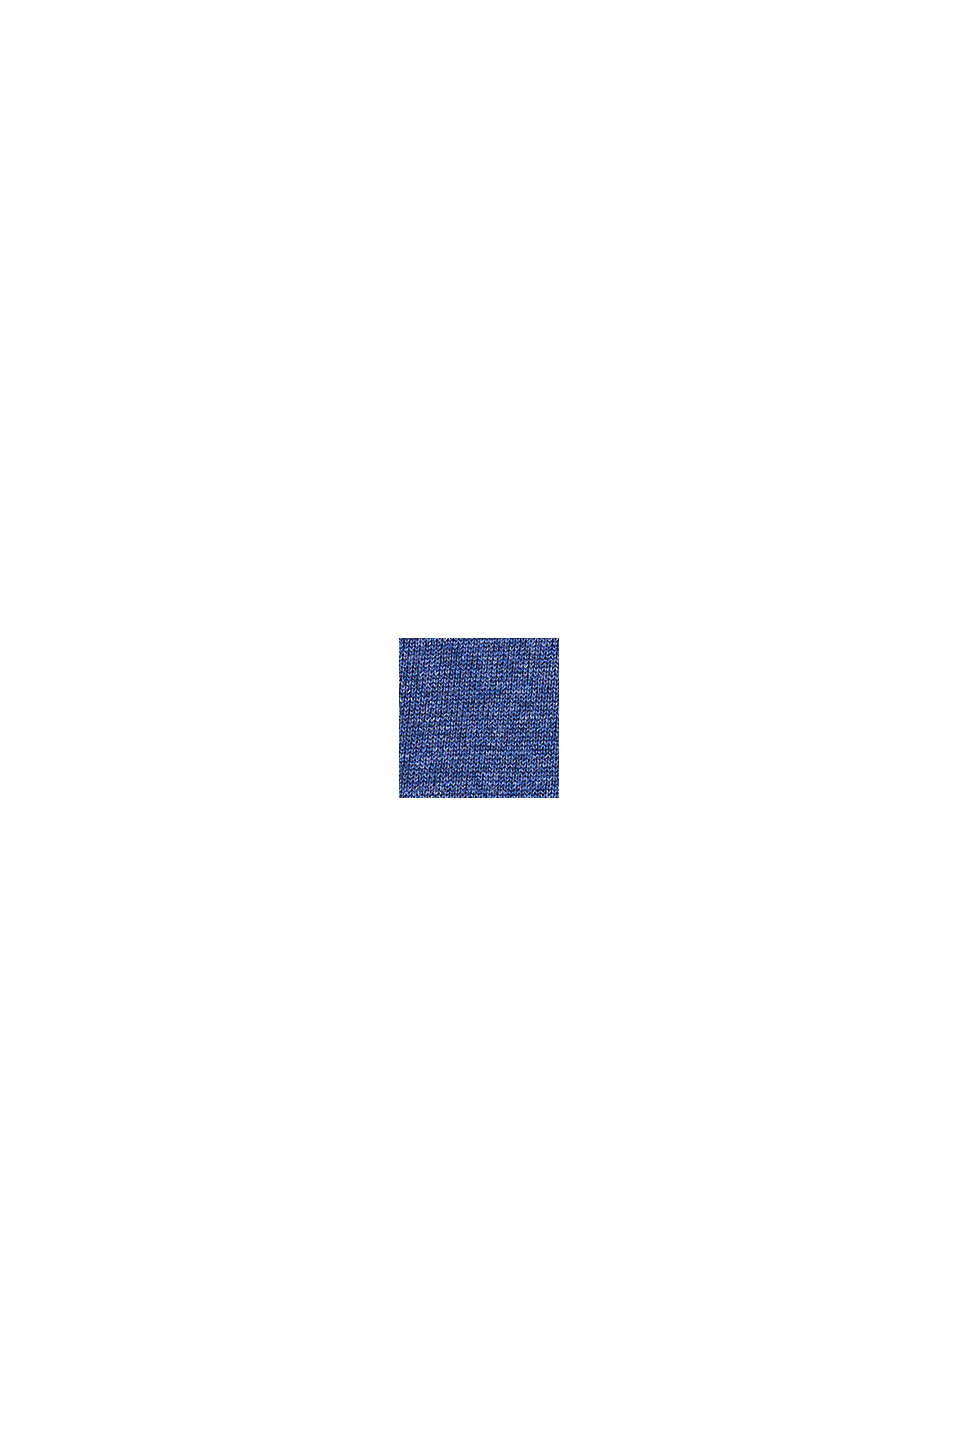 Pullover con girocollo, 100% cotone, DARK BLUE, swatch